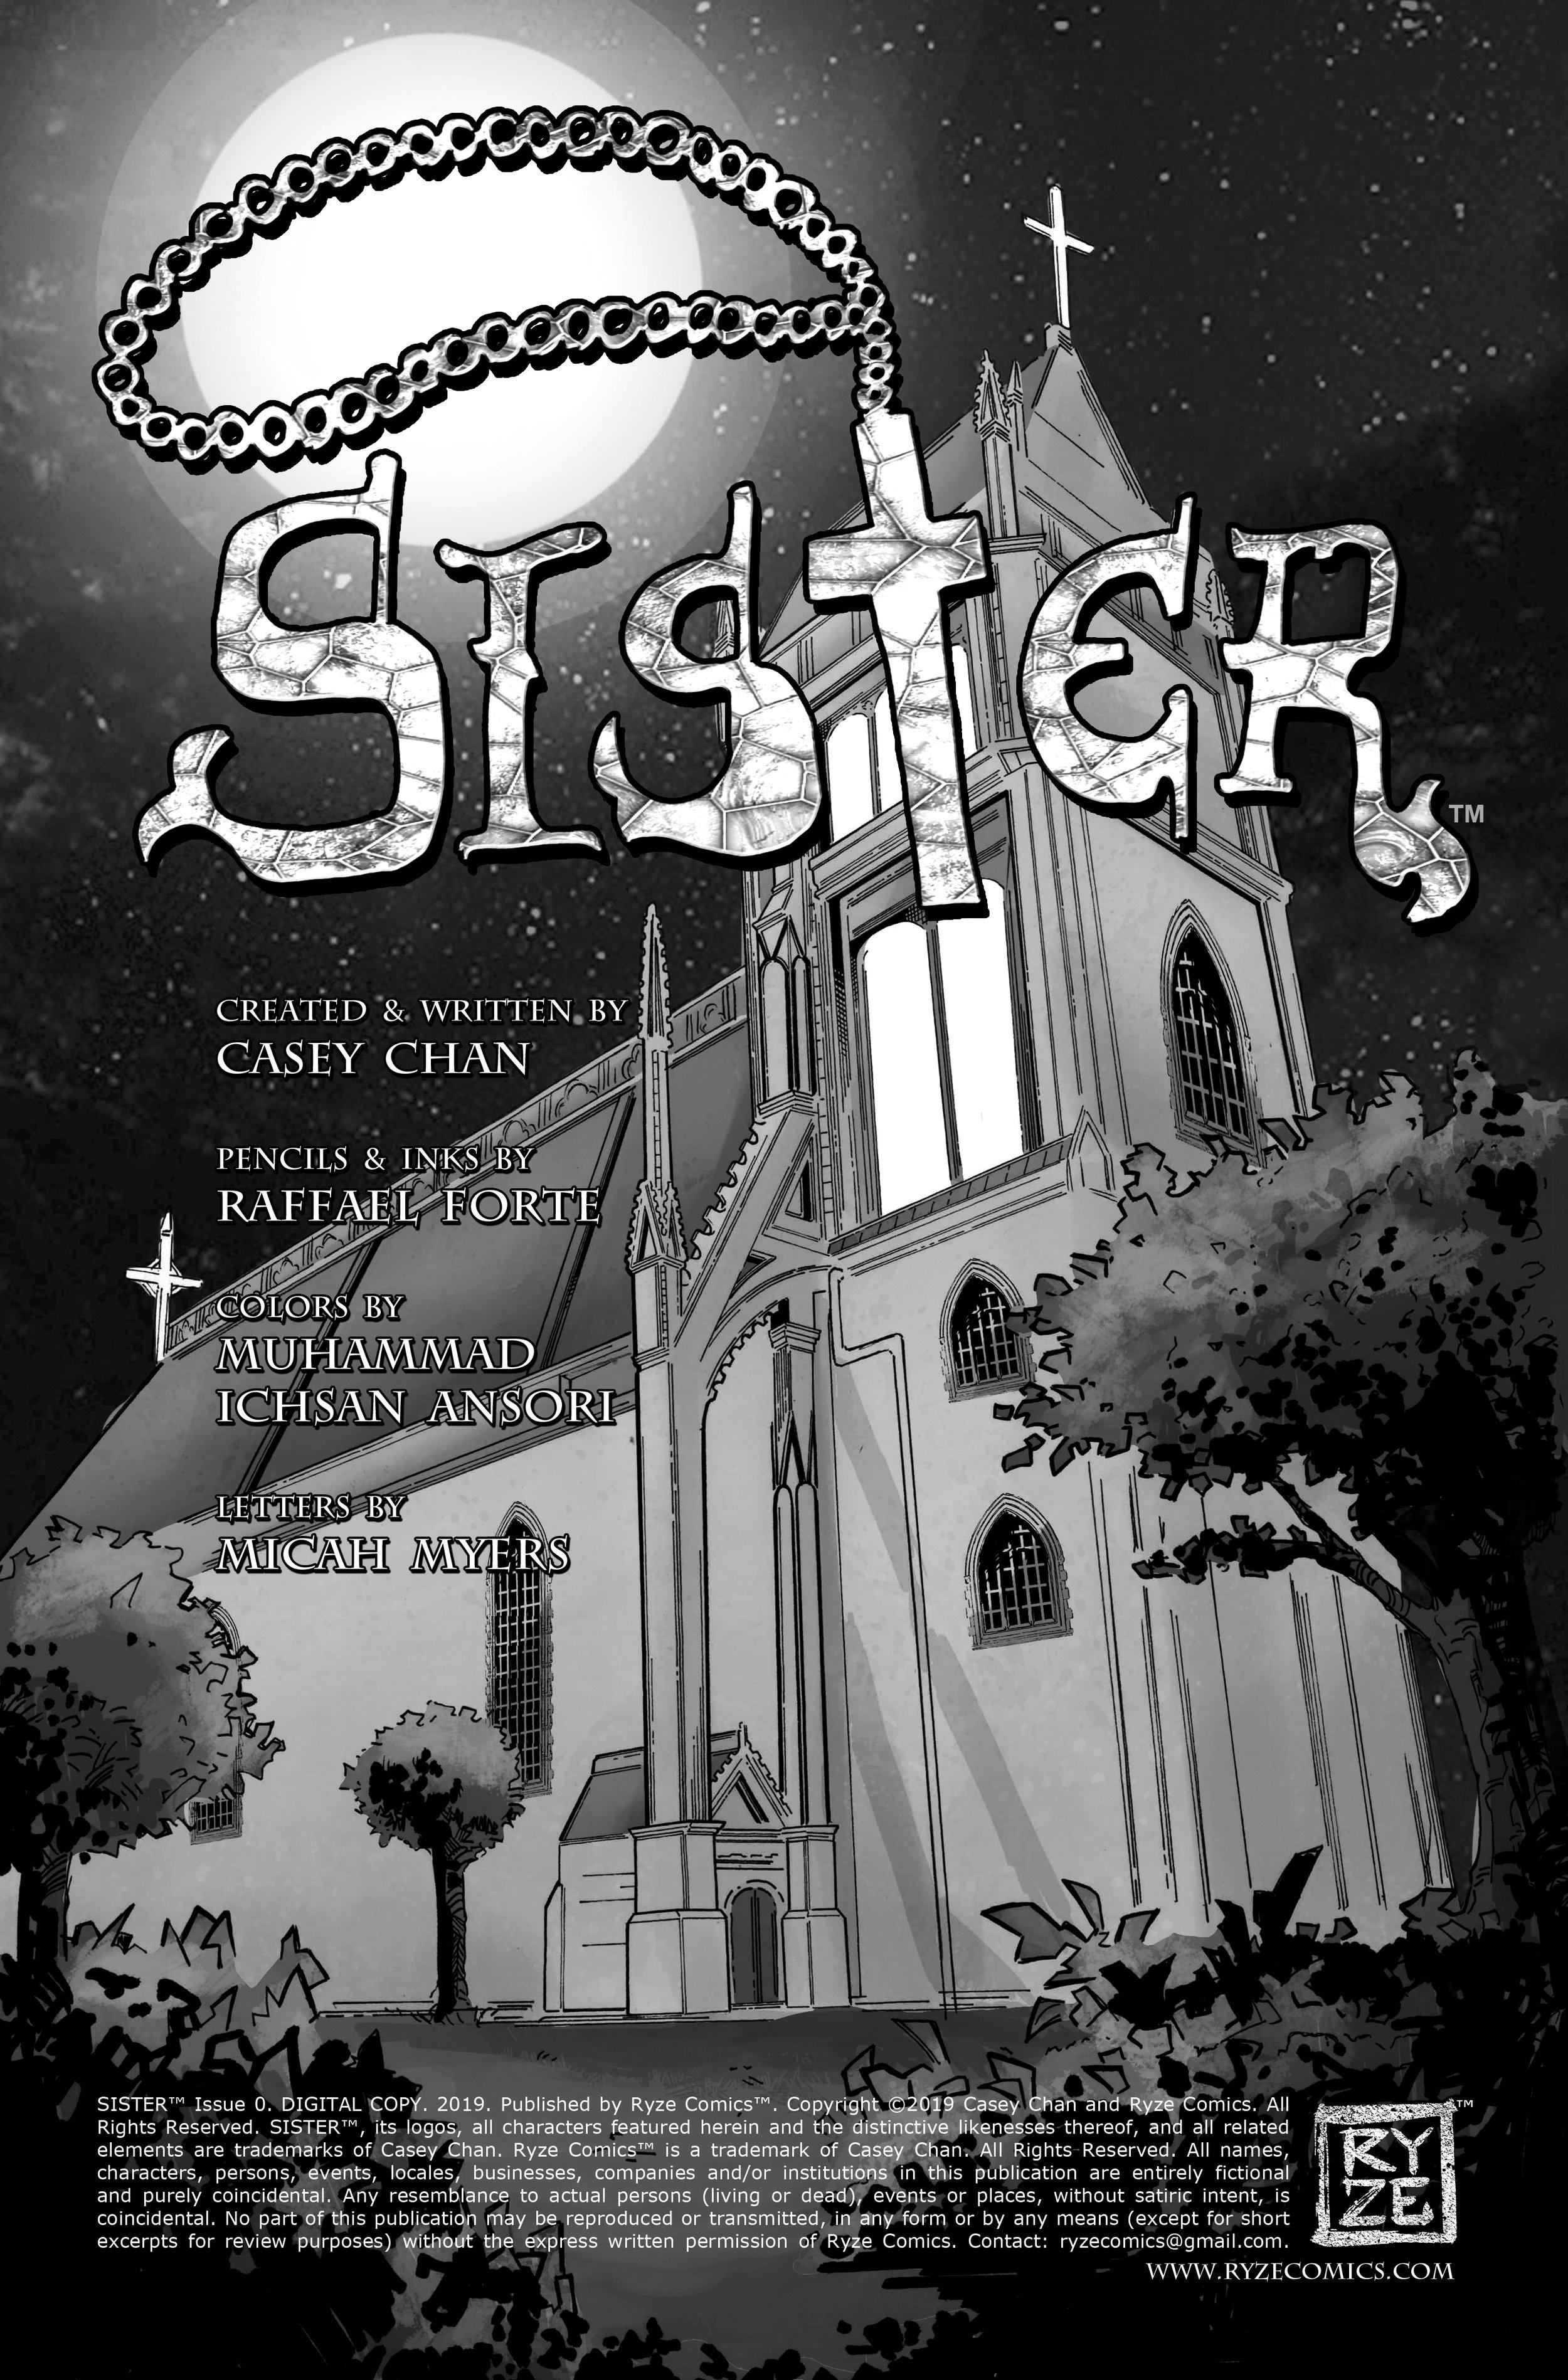 SISTER - Ryze Comics - Feb2019.400 - pg6 BW.jpg